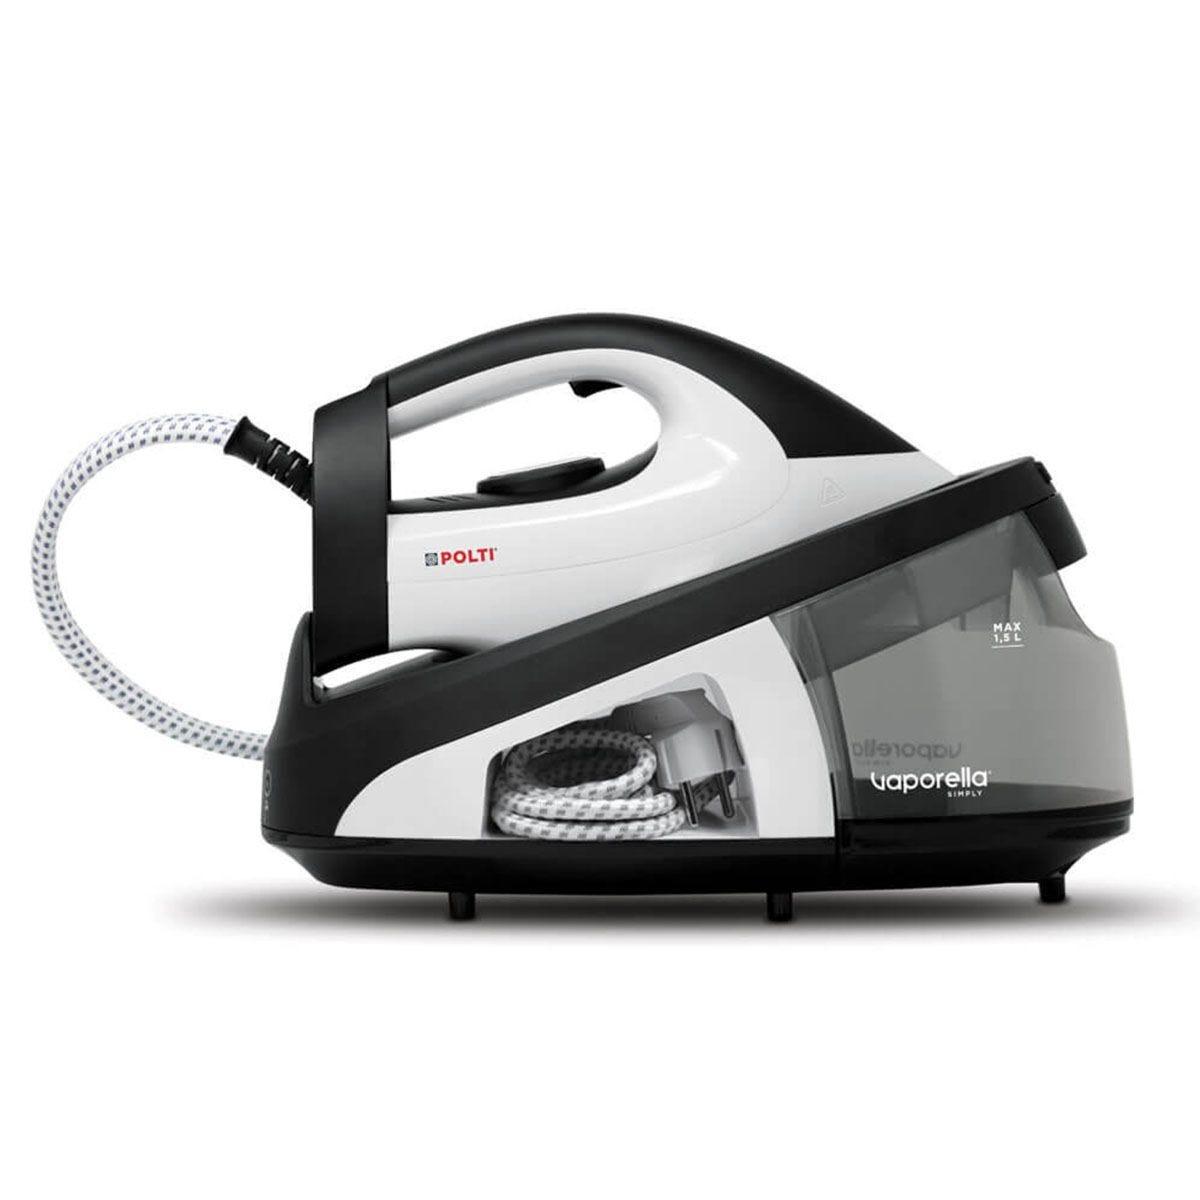 Polti Vaporella SDA2025GE Simply VS20:20 Steam Generator – White & Black